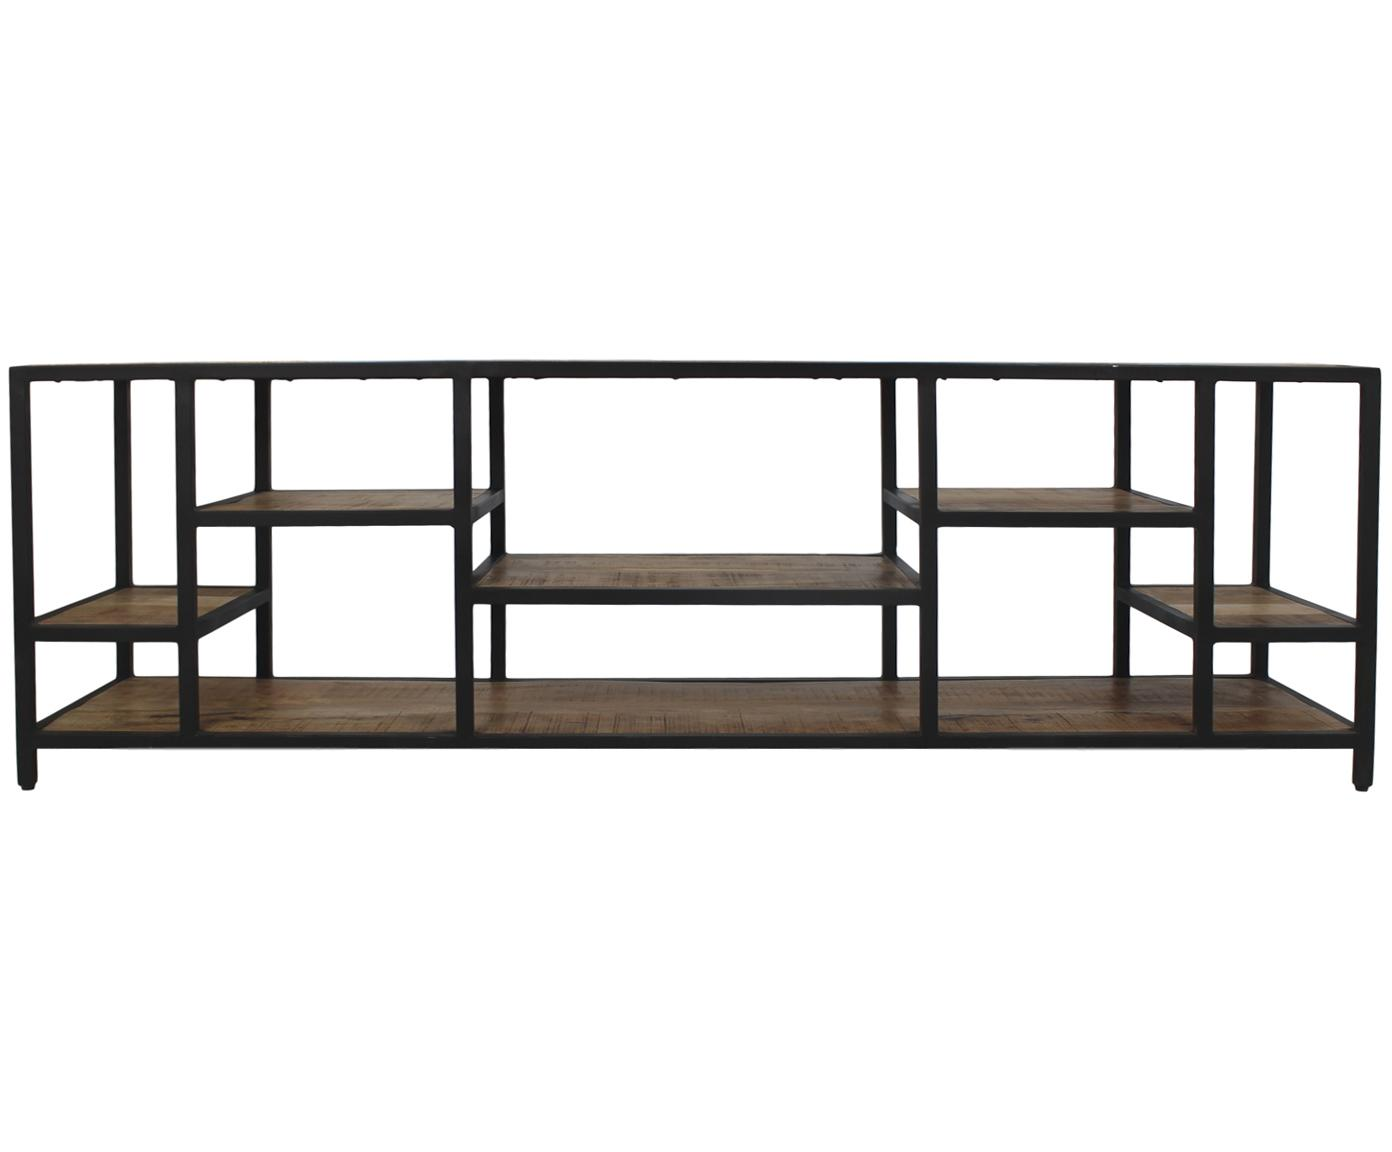 Metall TV-Lowboard Levels, Mangoholz, Metall, Braun, Schwarz, 170 x 55 cm